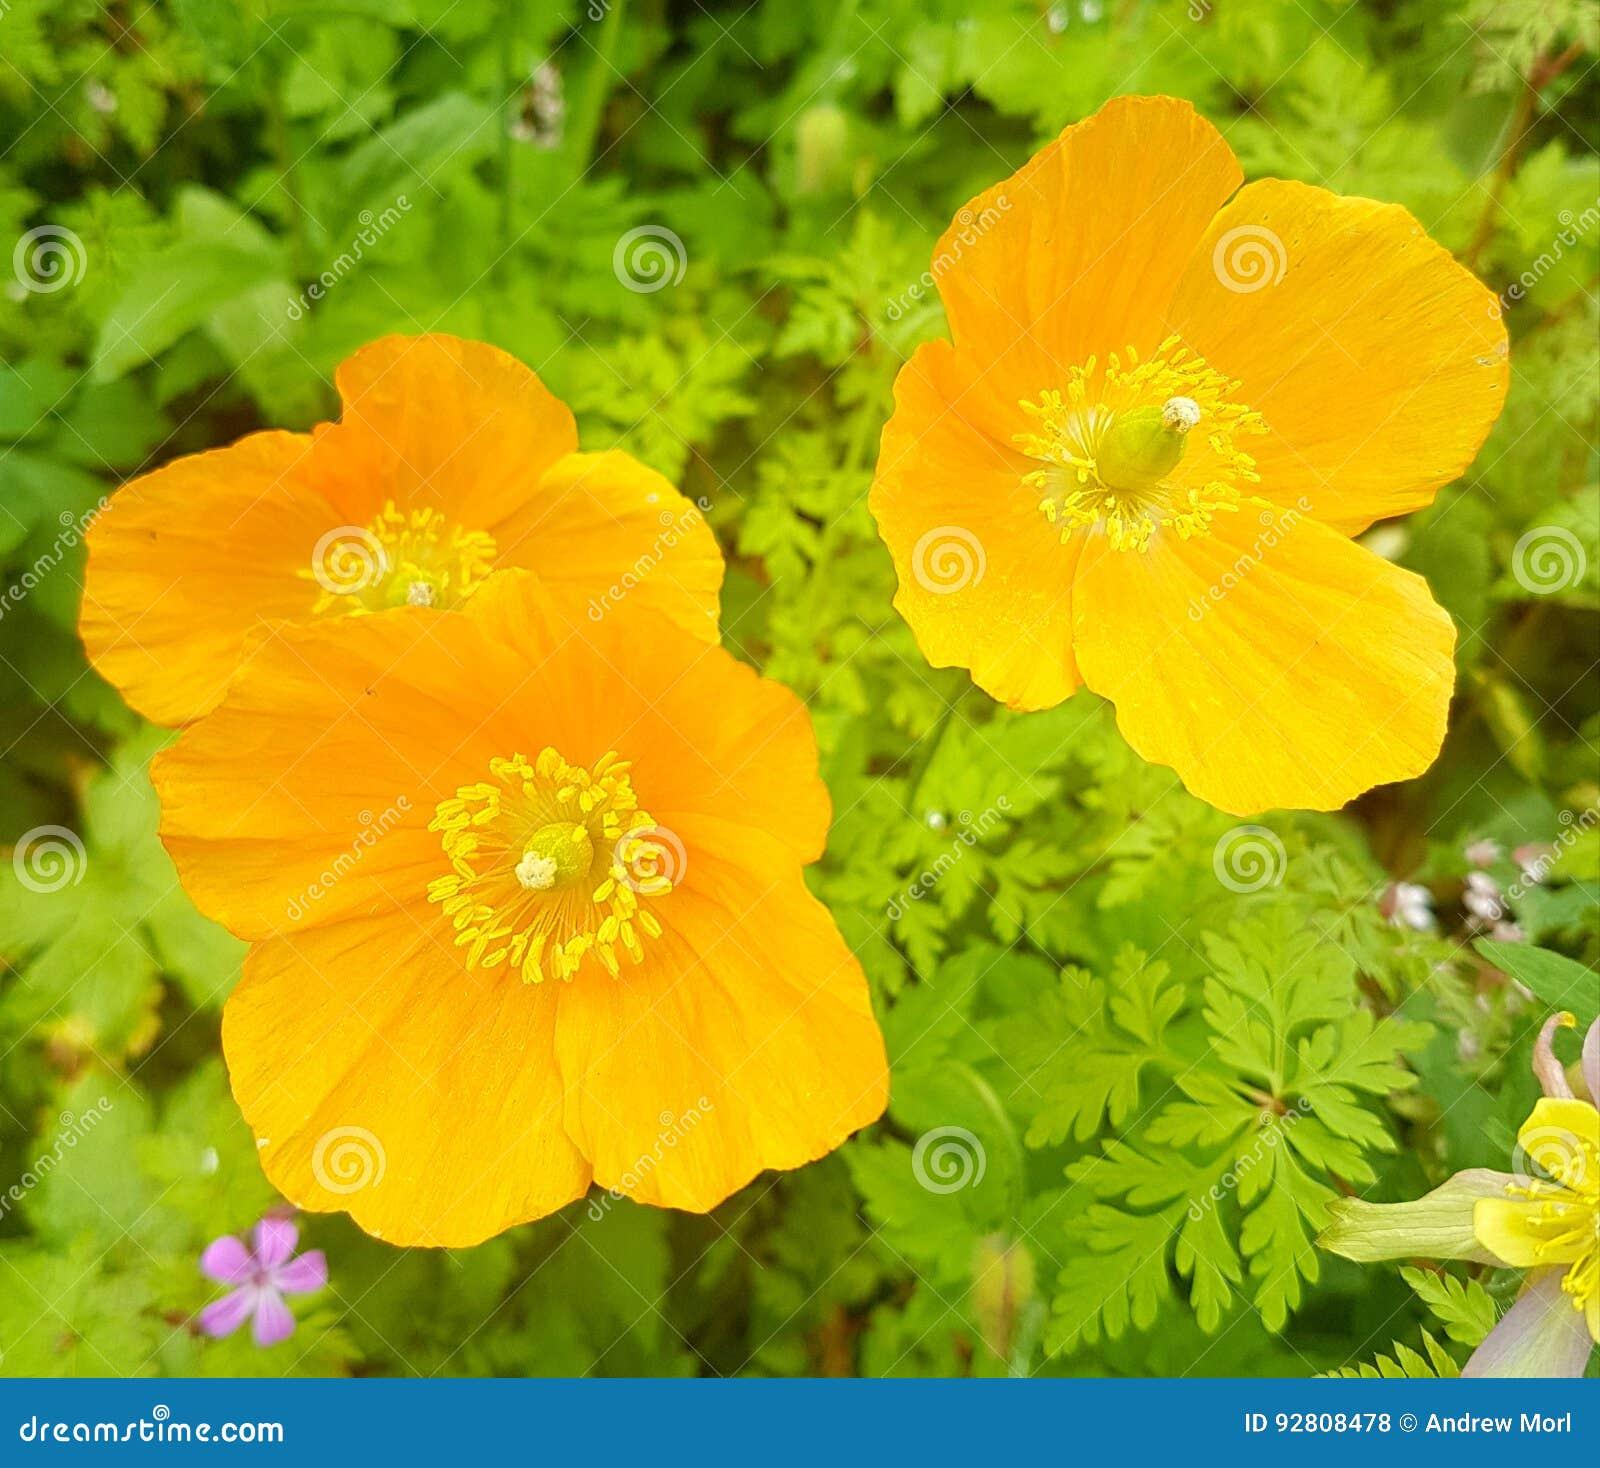 Yellow Poppy Stock Photo Image Of Spring Yellow Flowers 92808478